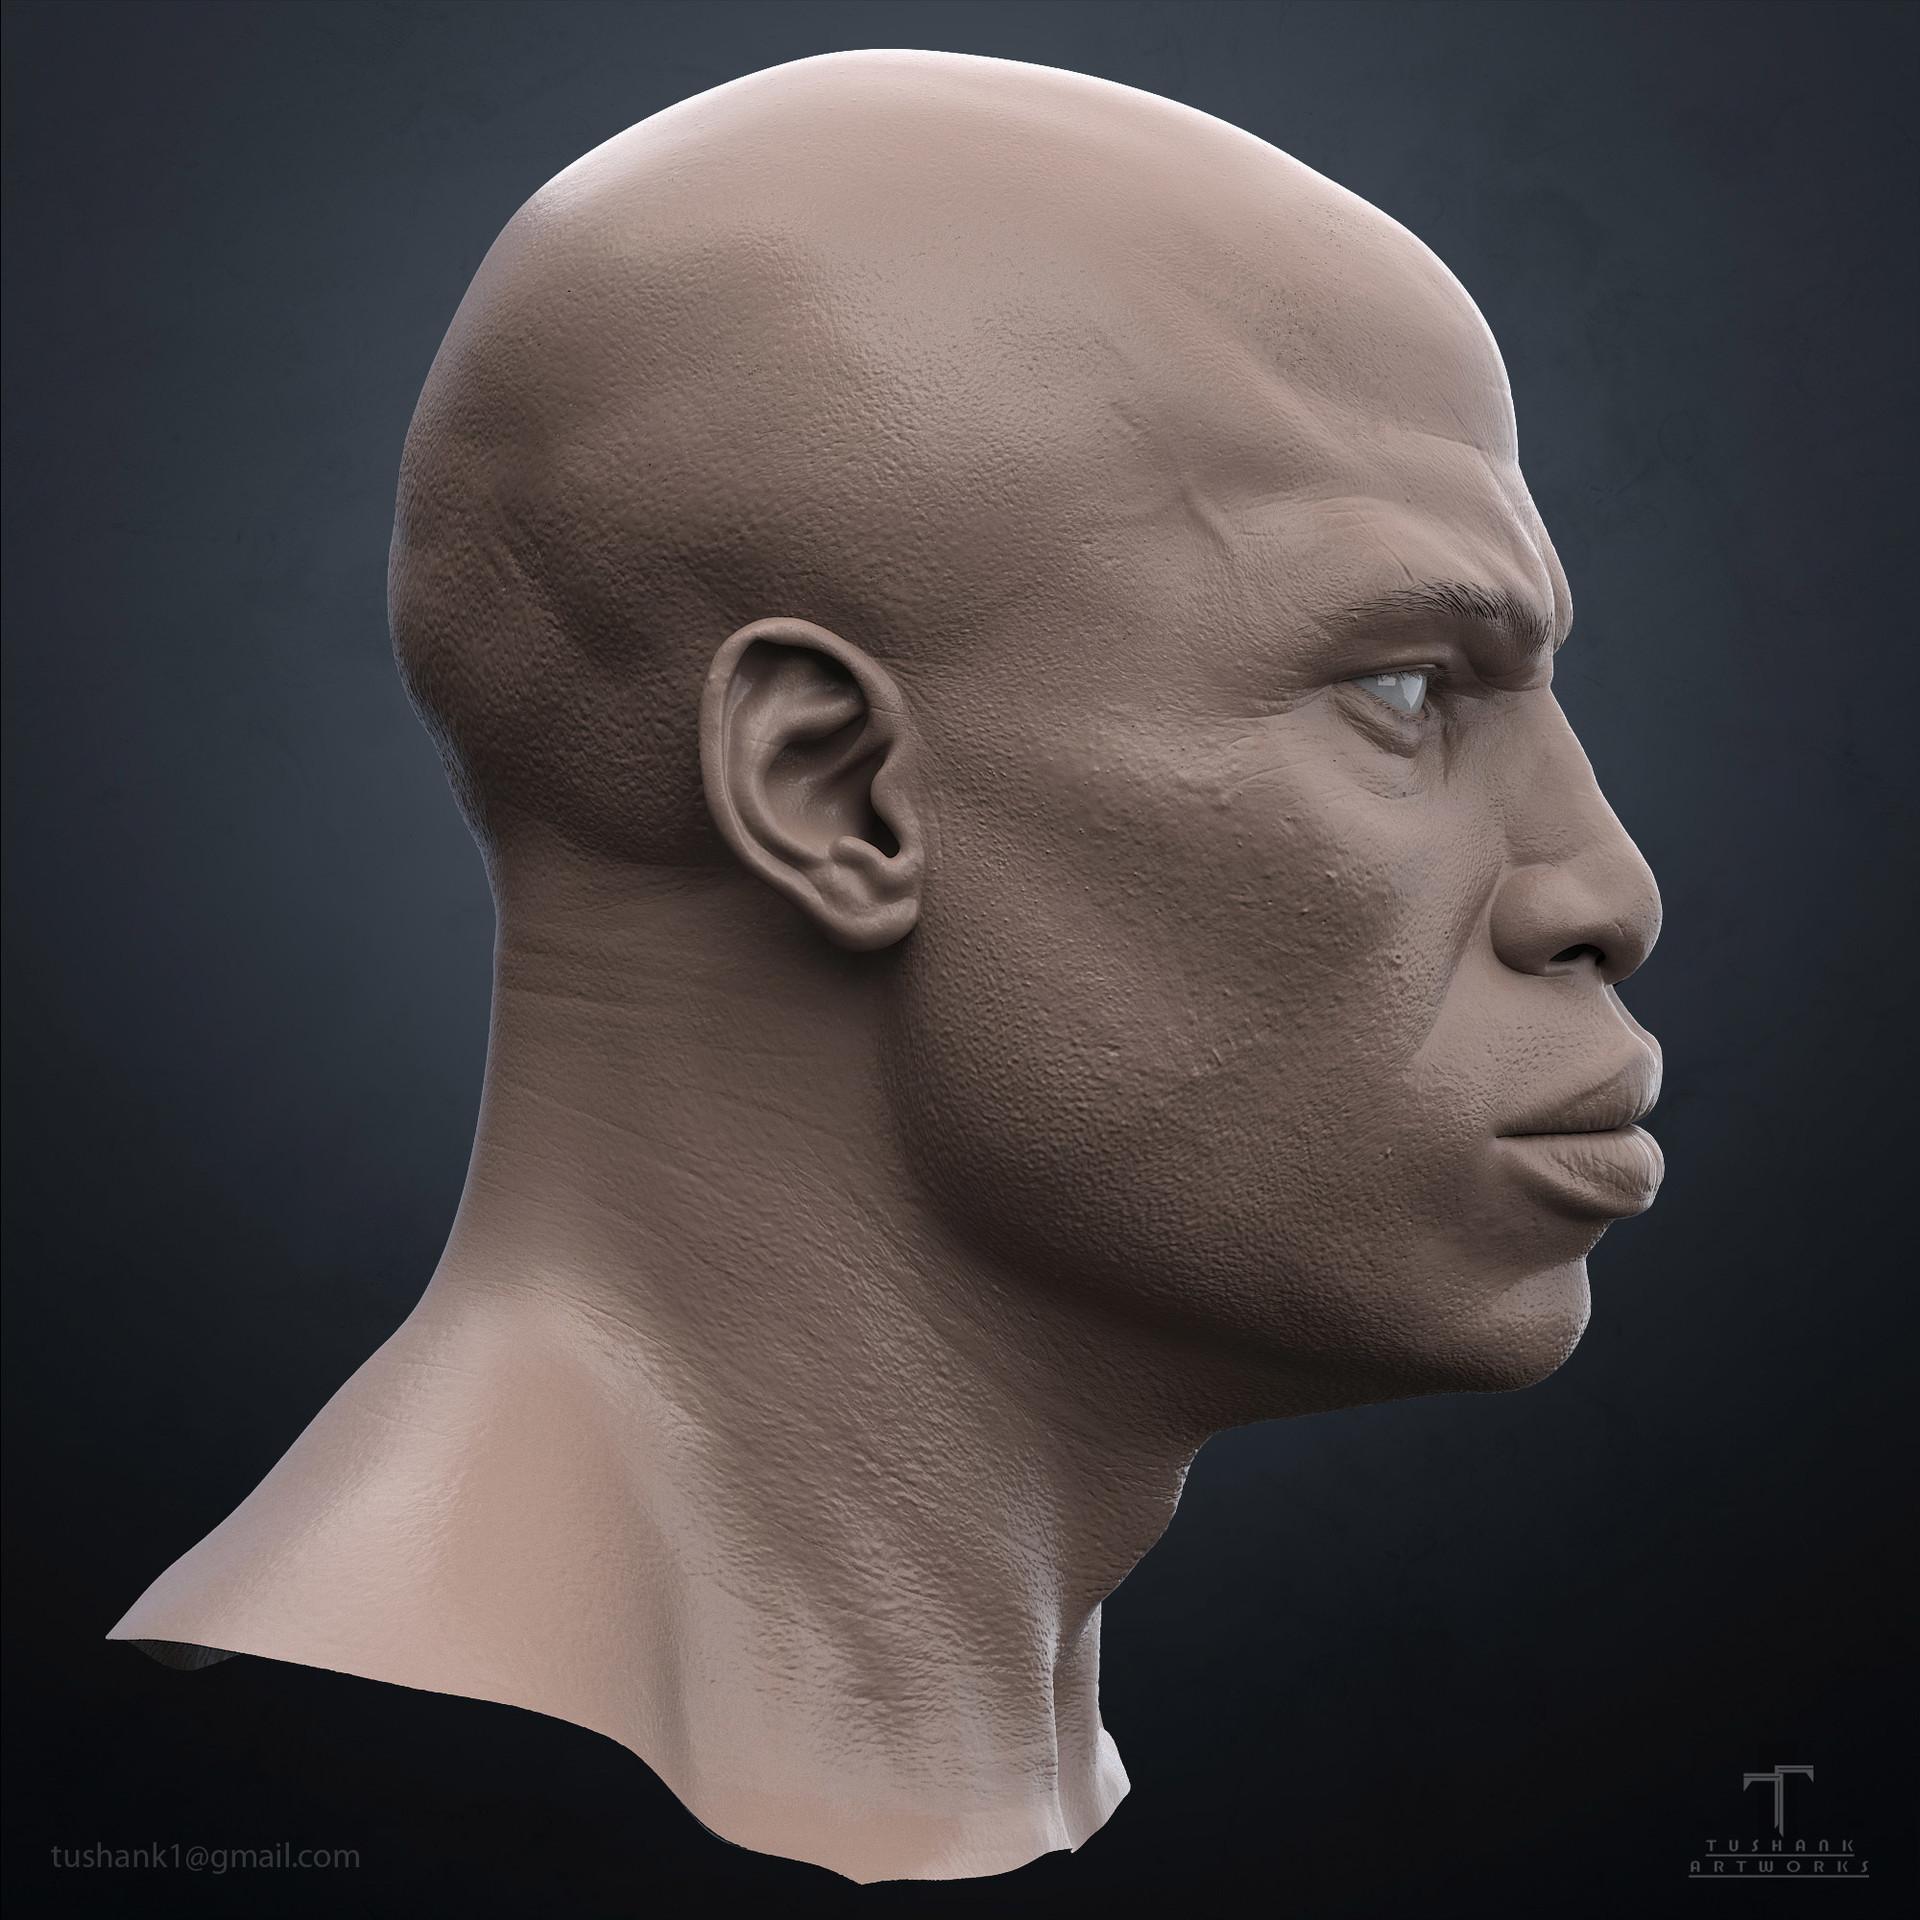 Tushank k jaiswal neolibyan head 3